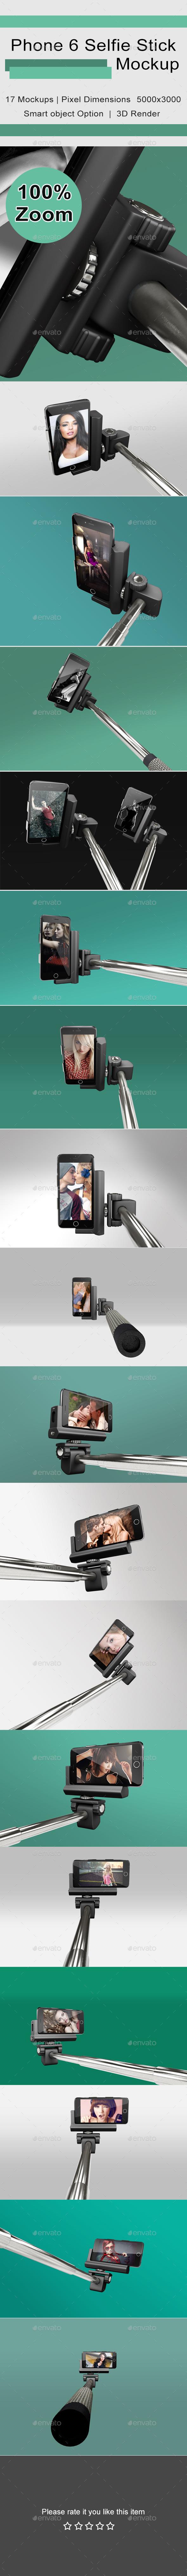 GraphicRiver Phone 6 Selfie Stick Mockup 11400673